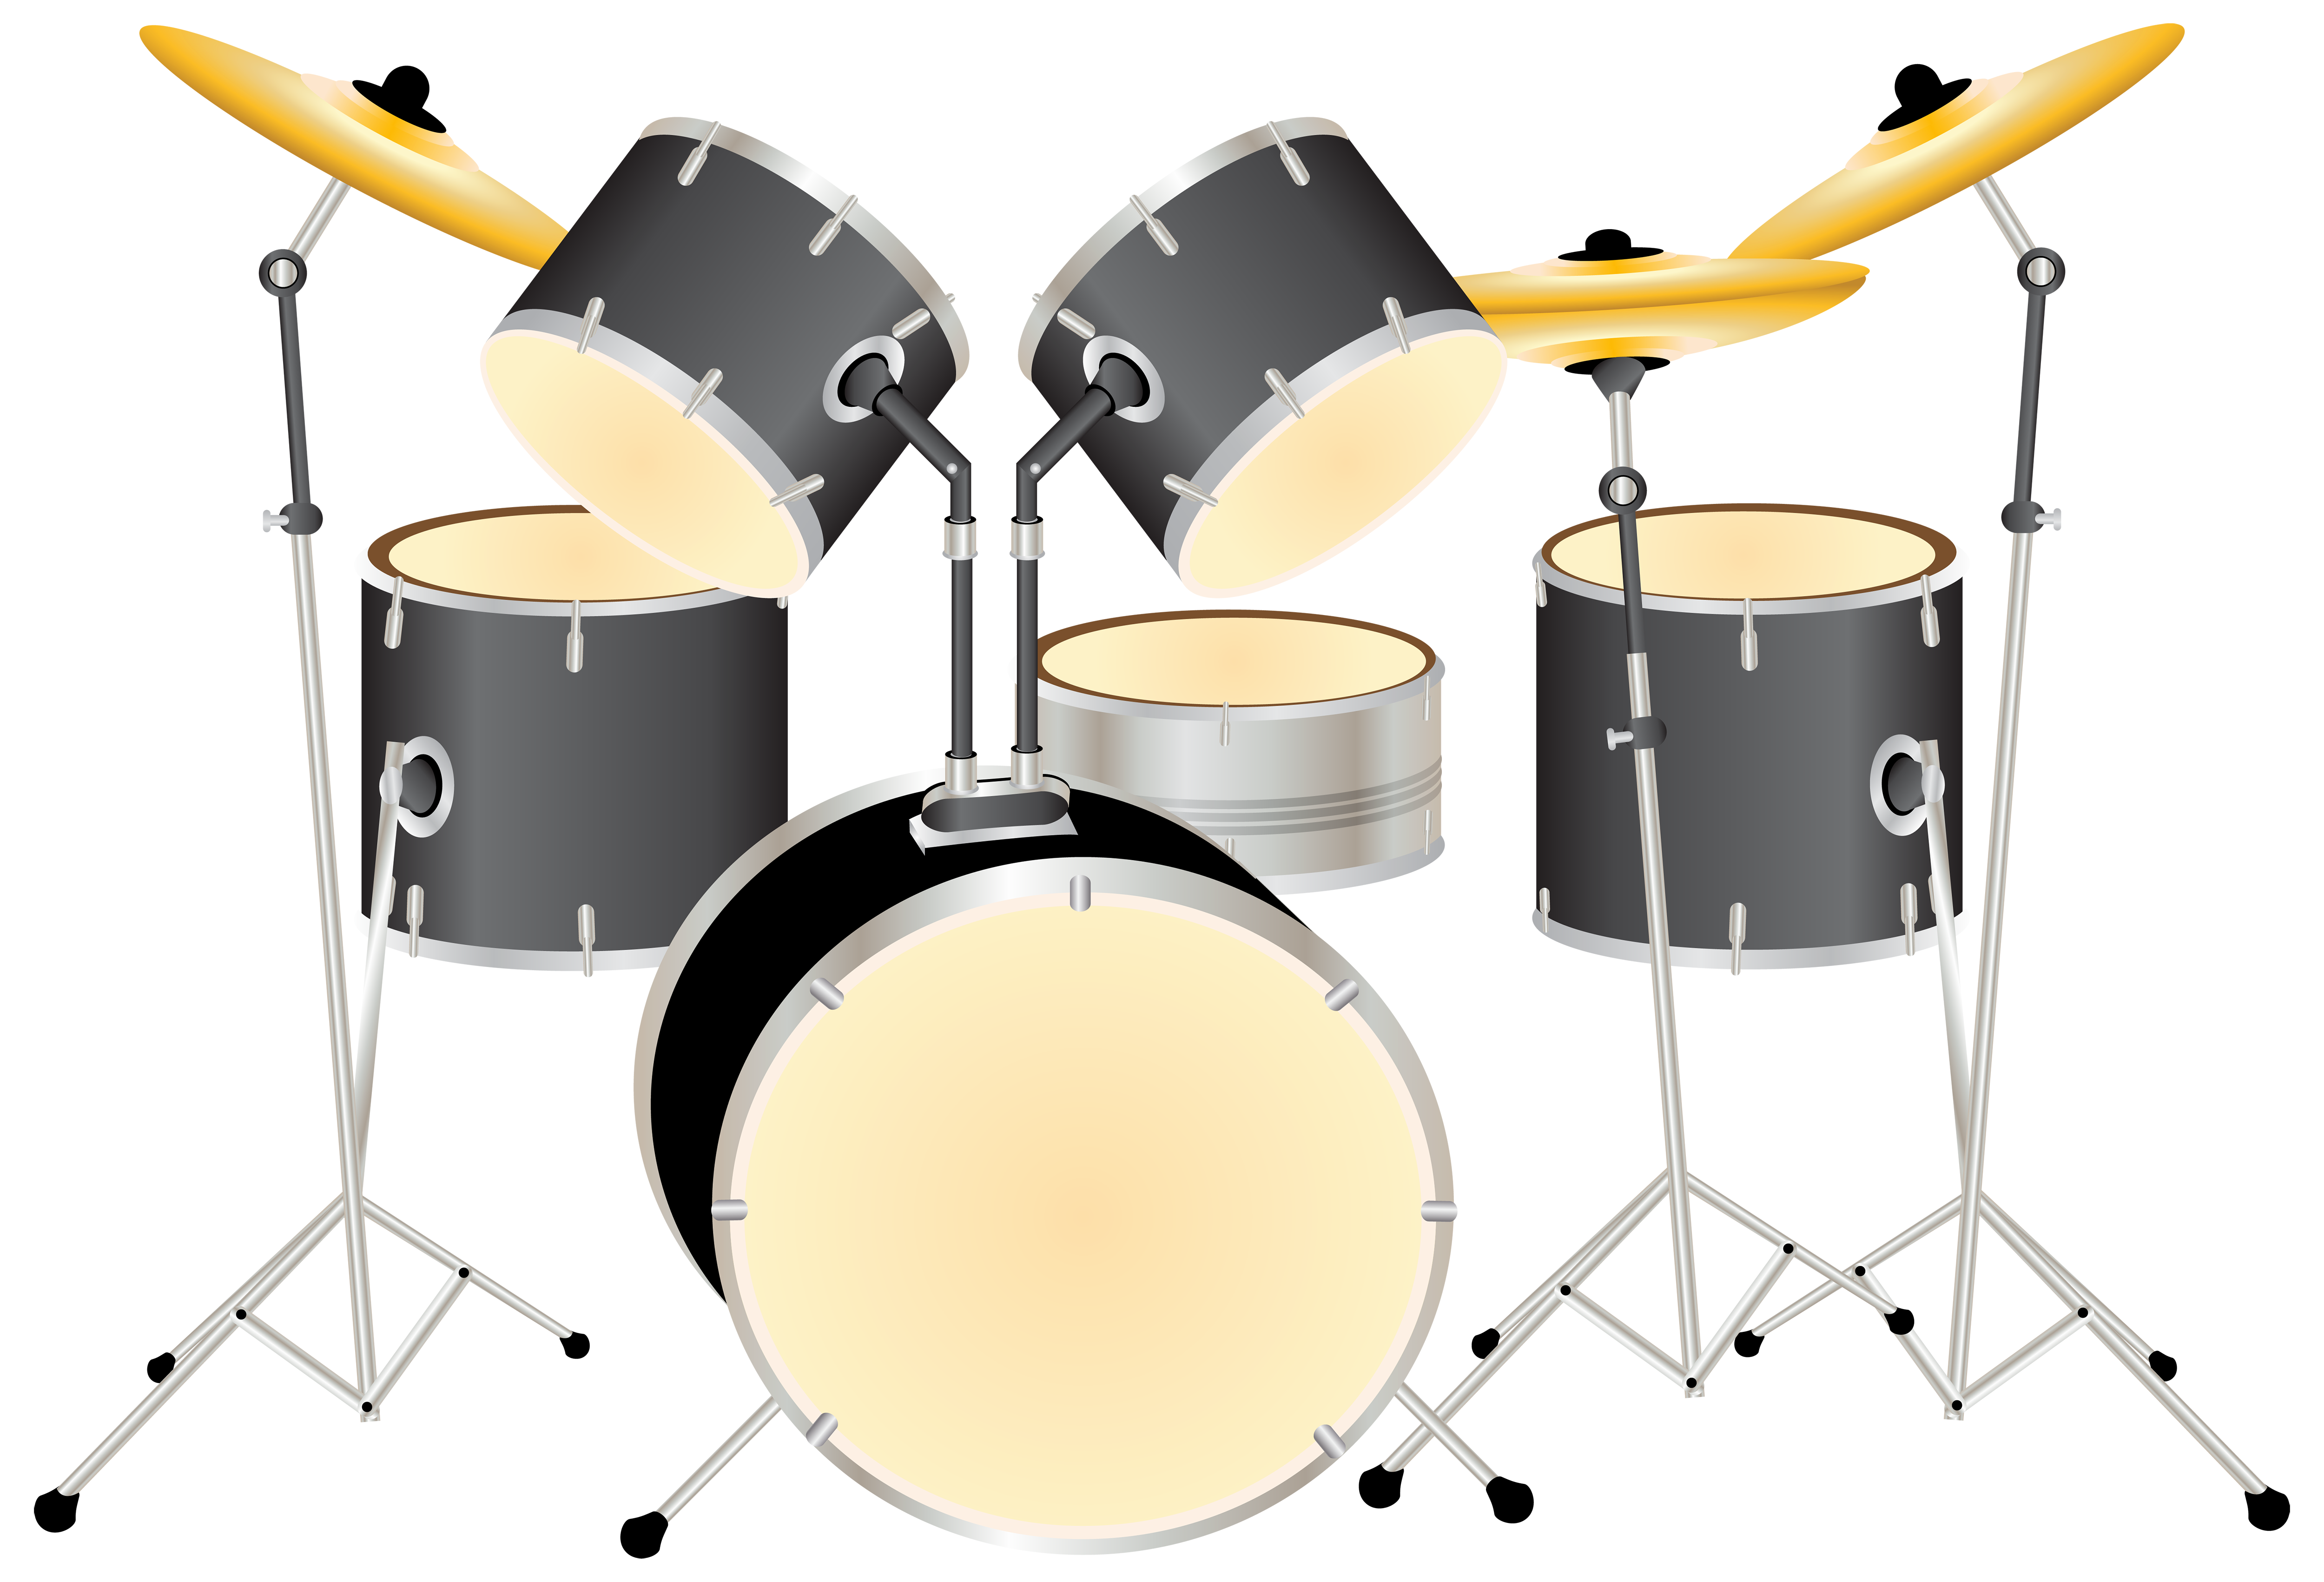 svg download Drums transparent drum kit. Png clipart best web